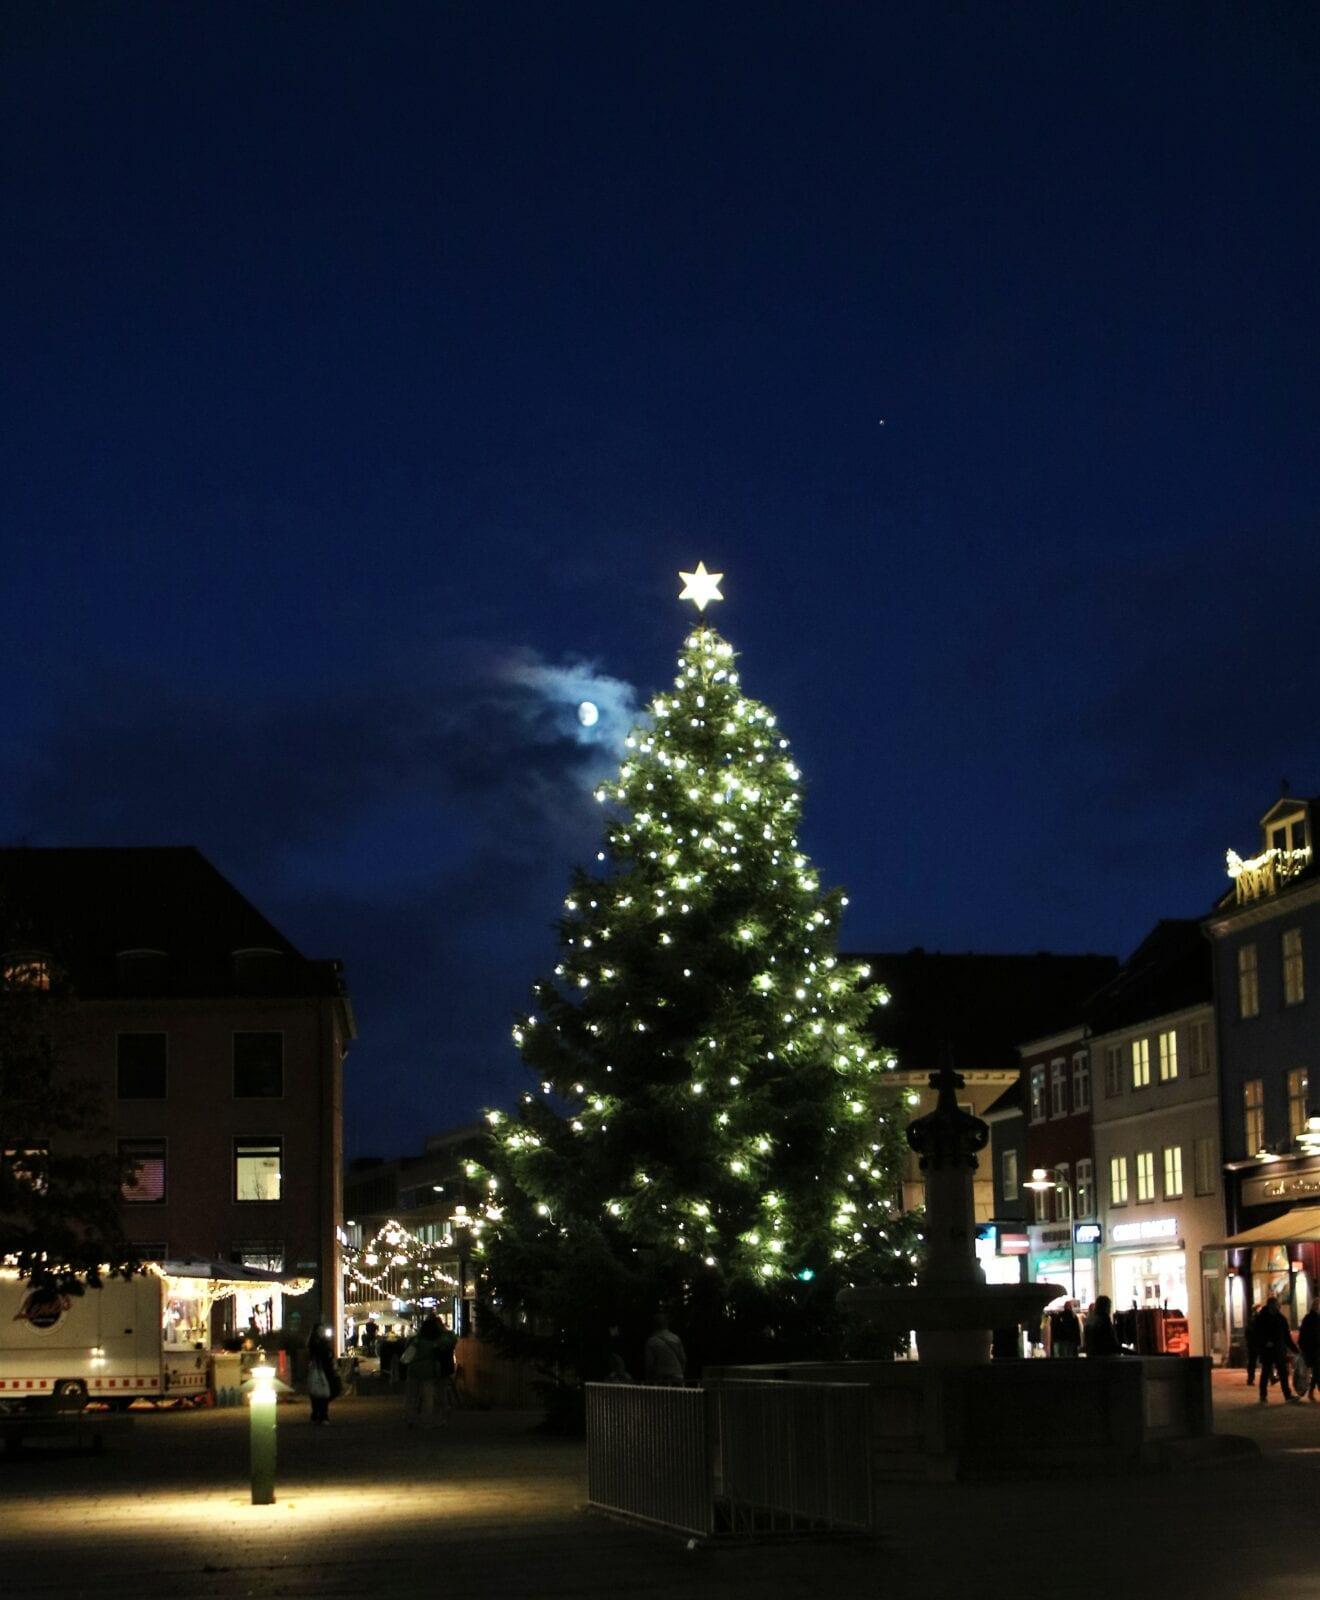 Julen har ramt Roskilde